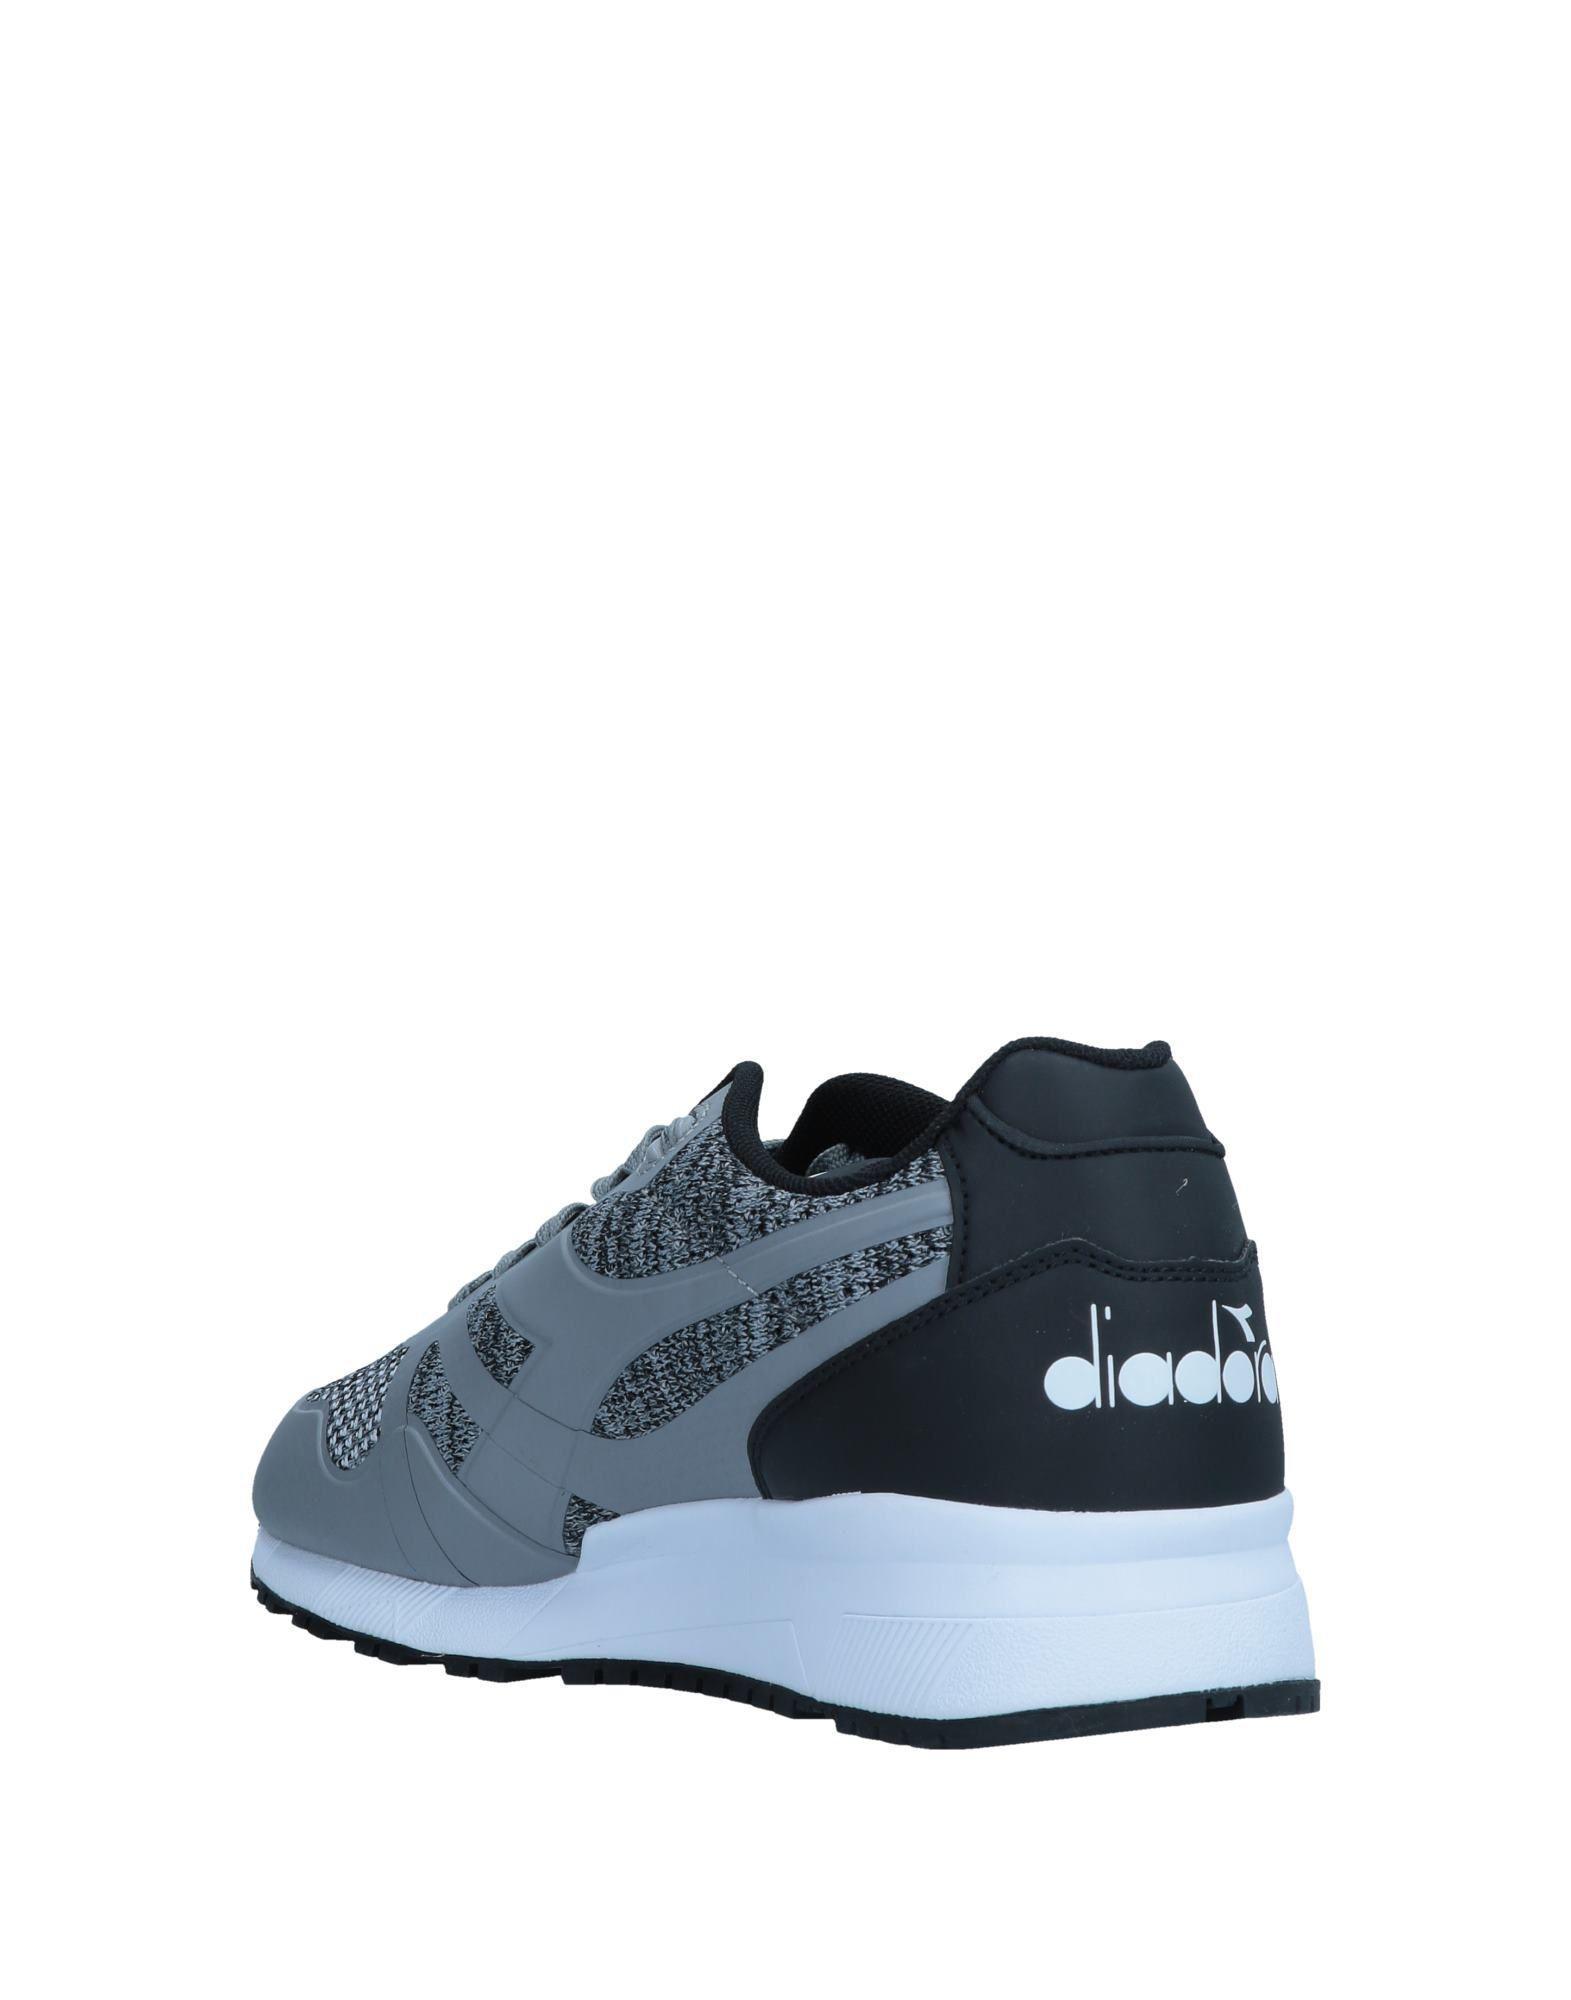 Sneakers & Deportivas Diadora de Caucho de color Gris para hombre